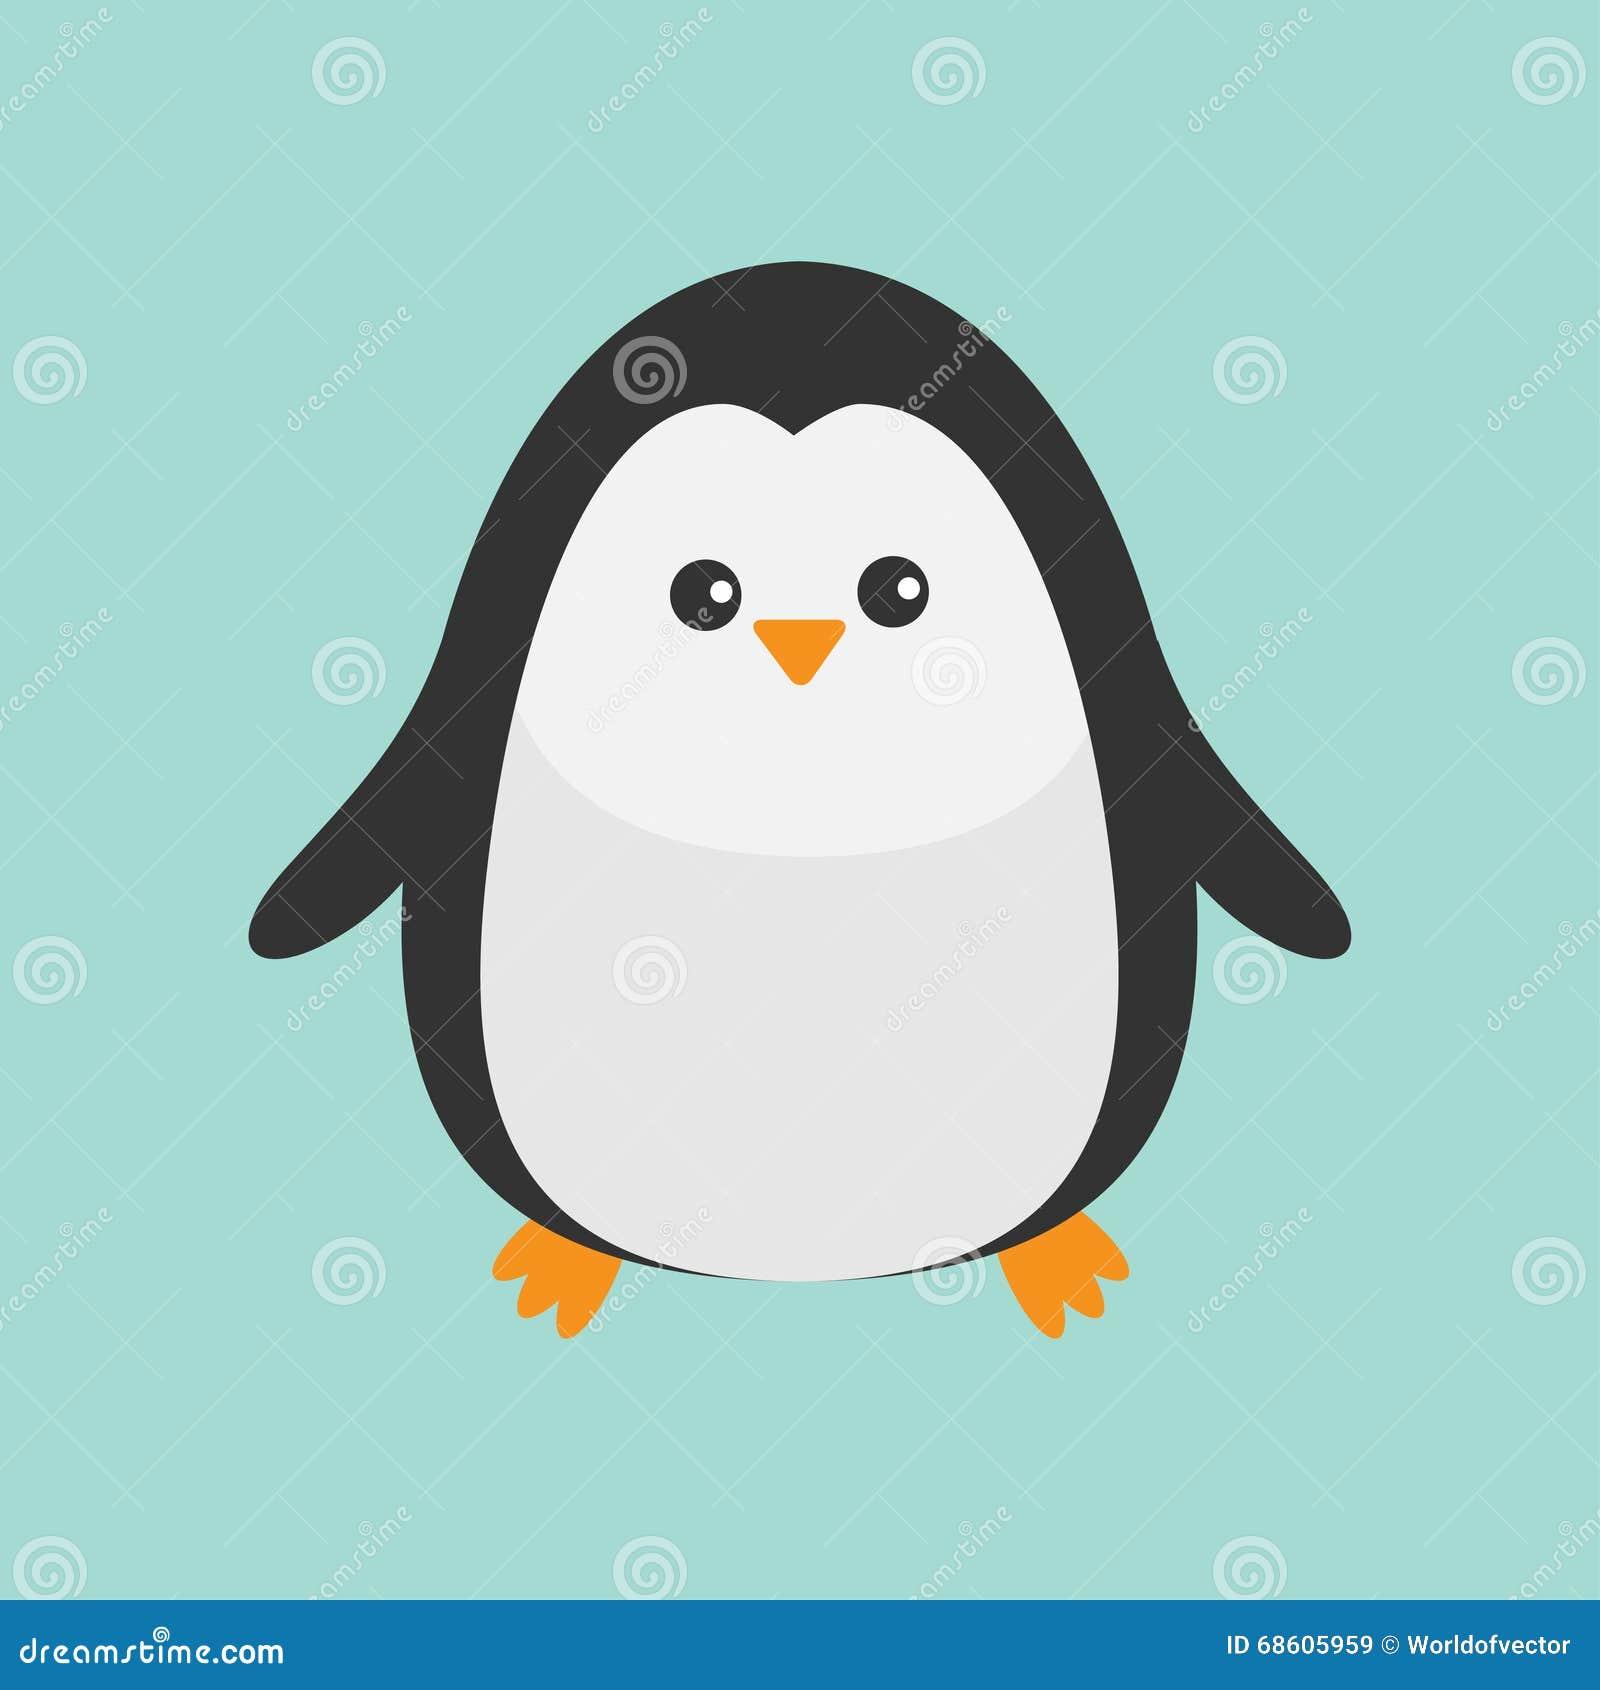 Penguin. Cute Cartoon Character. Baby Bird. Arctic Animal